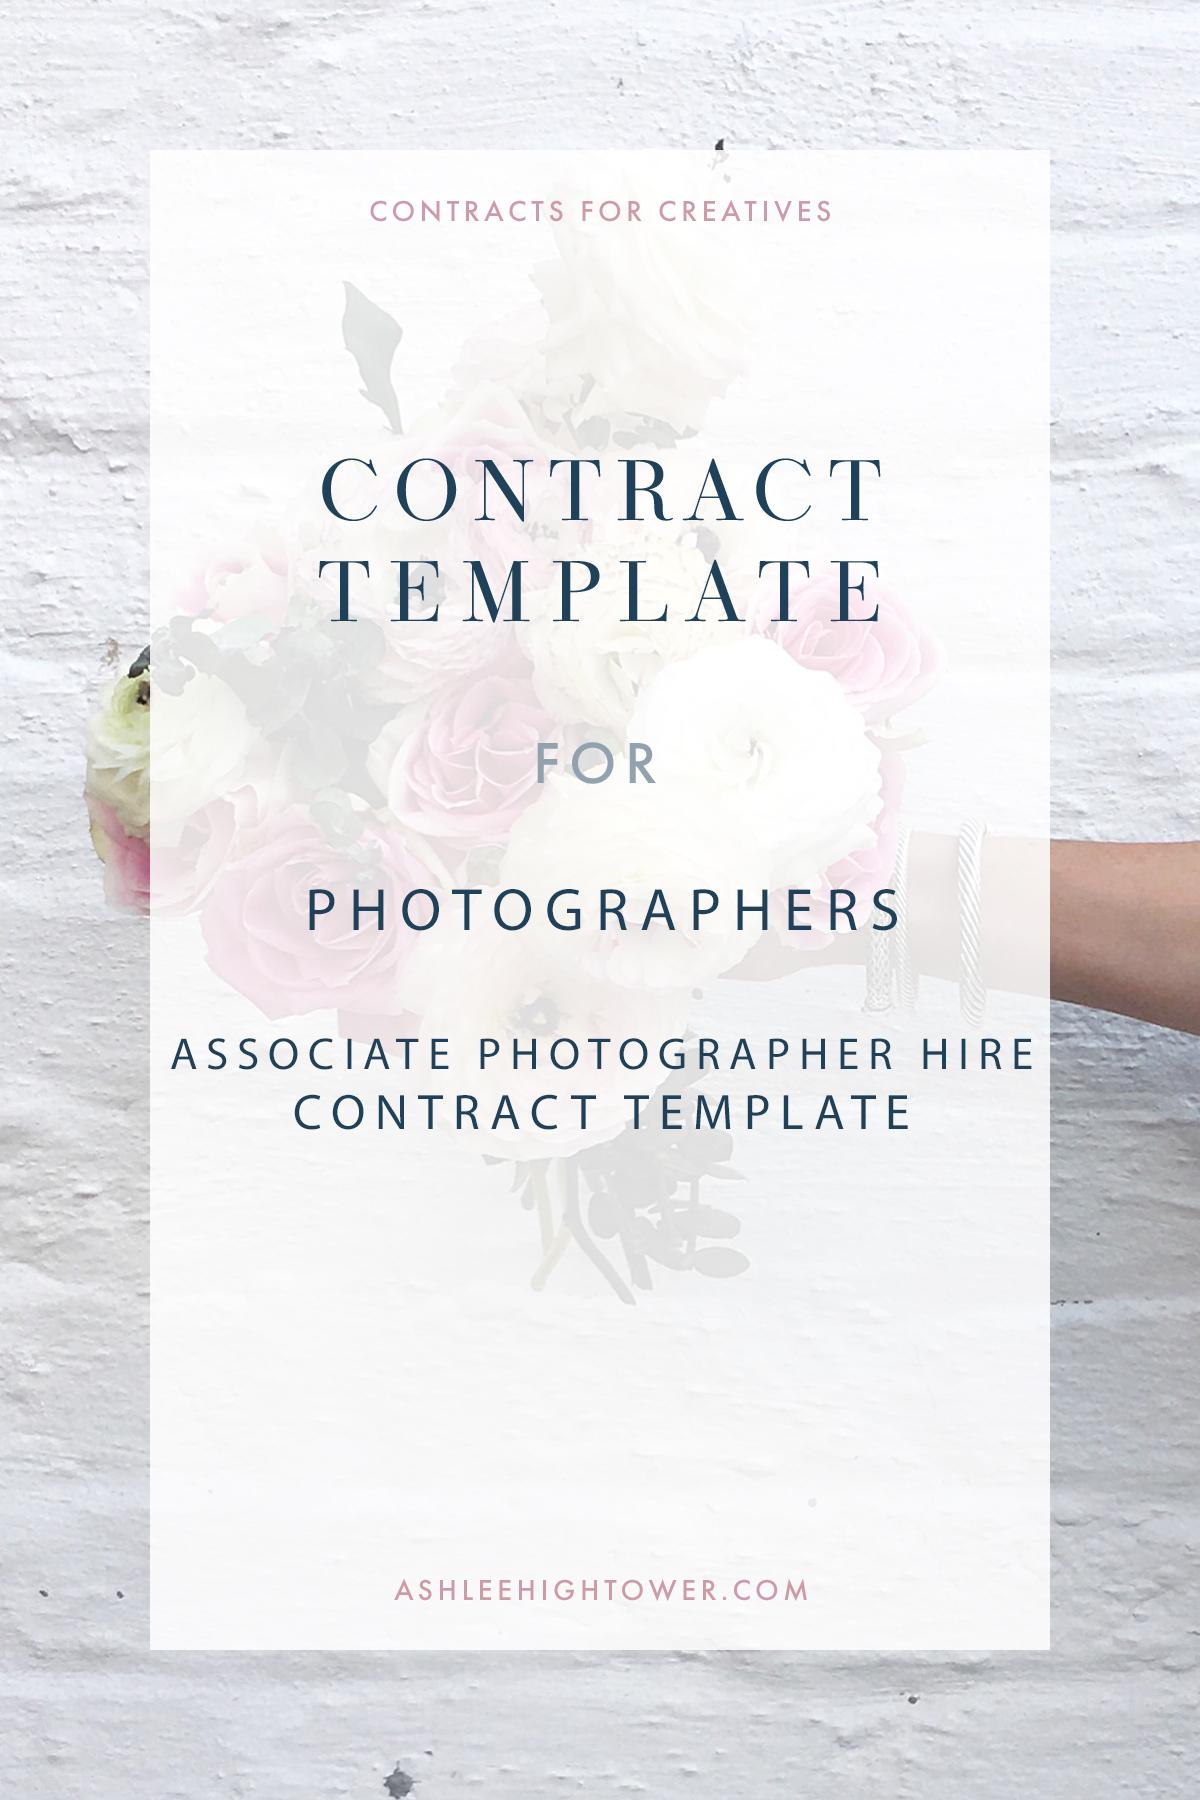 Associate Photographer Contract Template